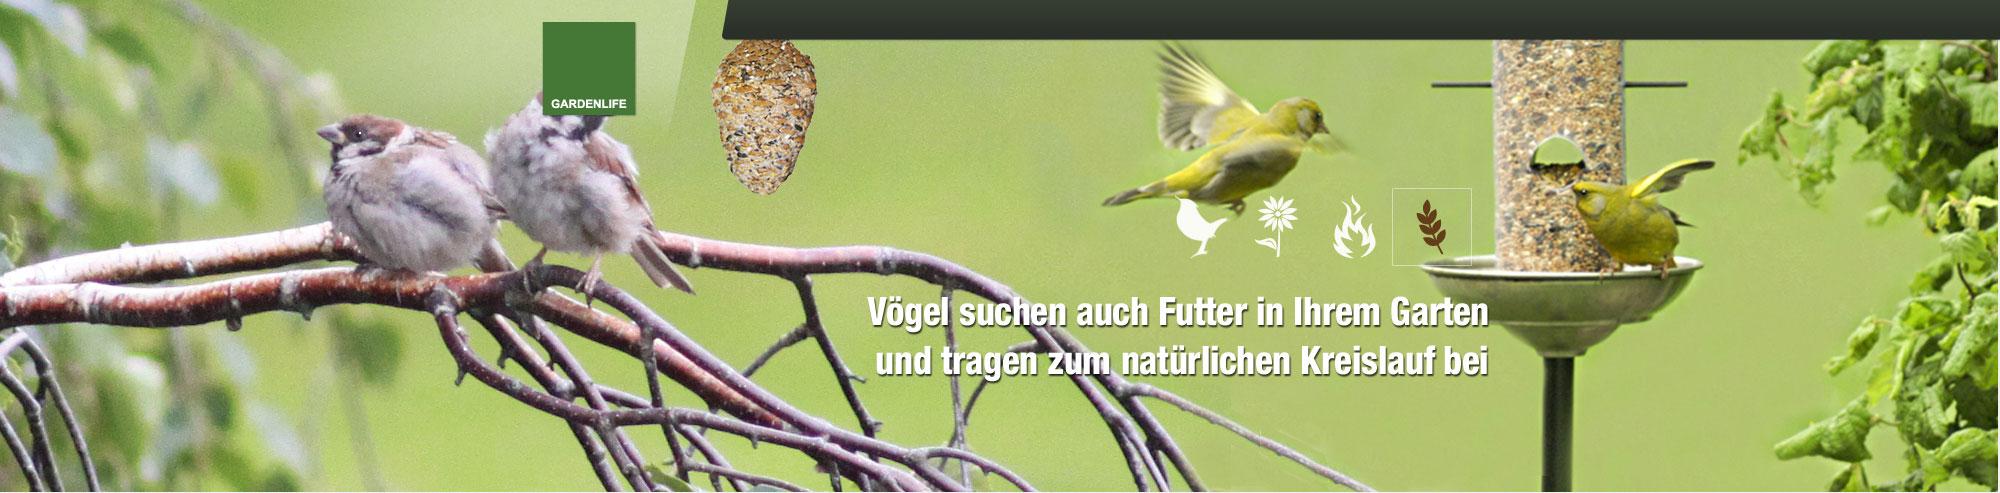 Garden Life Bird Online Shop, Bild 2